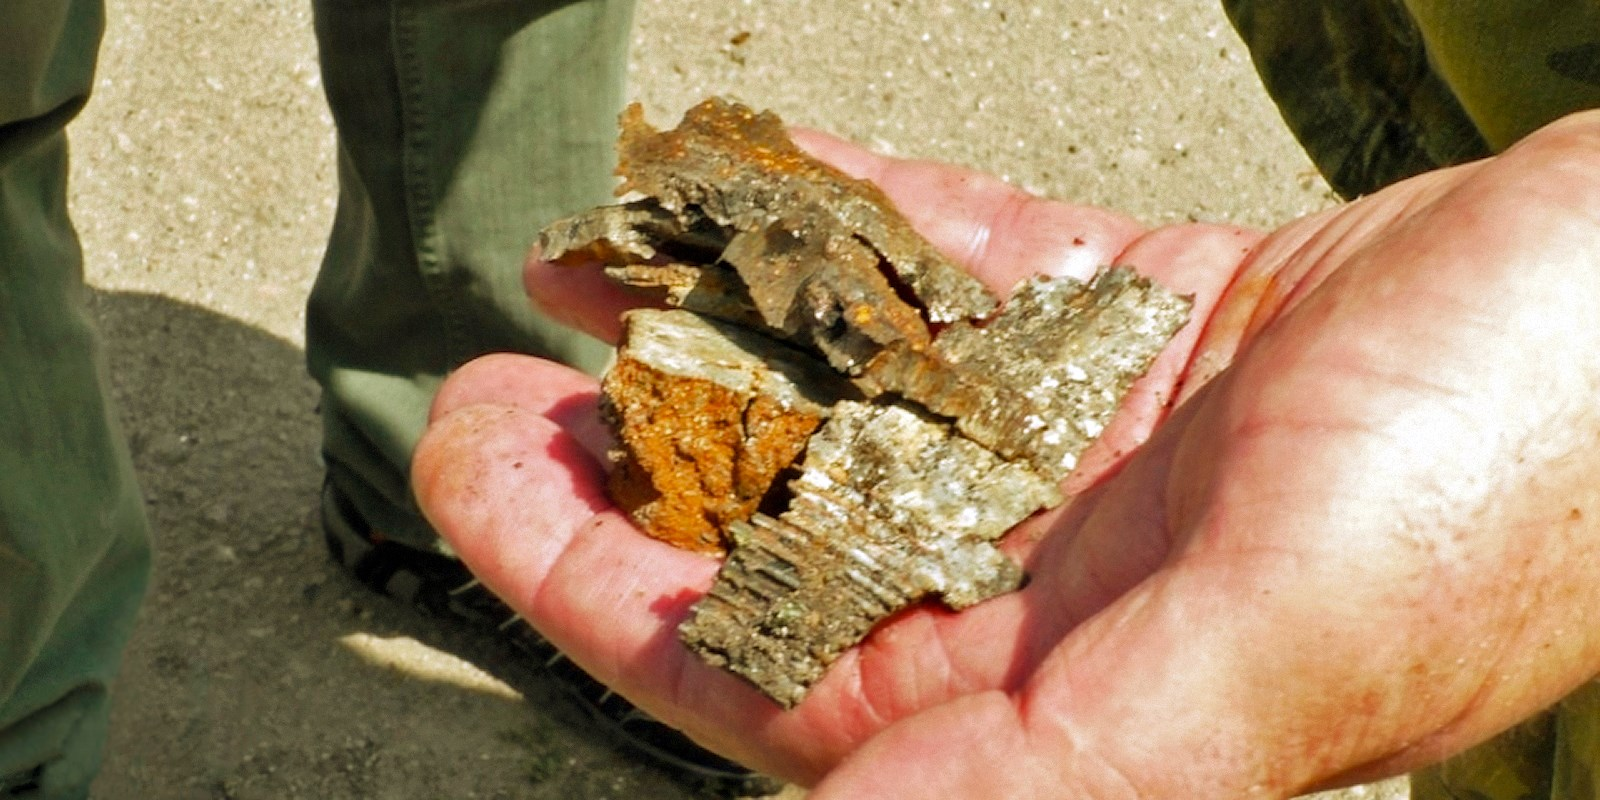 00 dnr donetsk pr. shell fragments. 050715